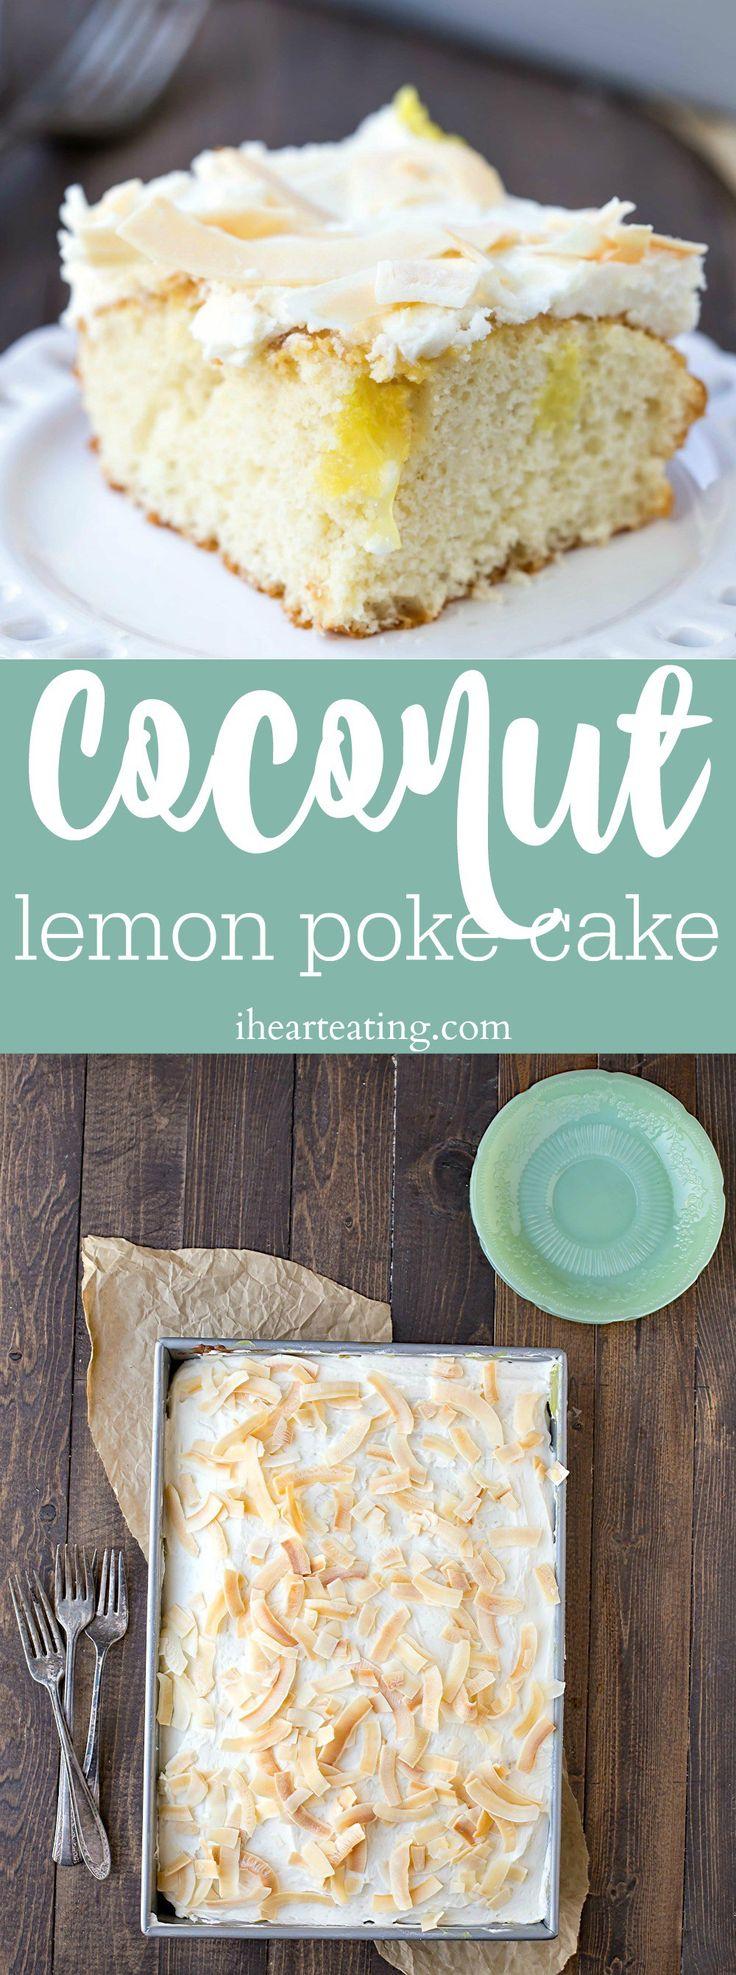 Coconut Lemon Poke Cake